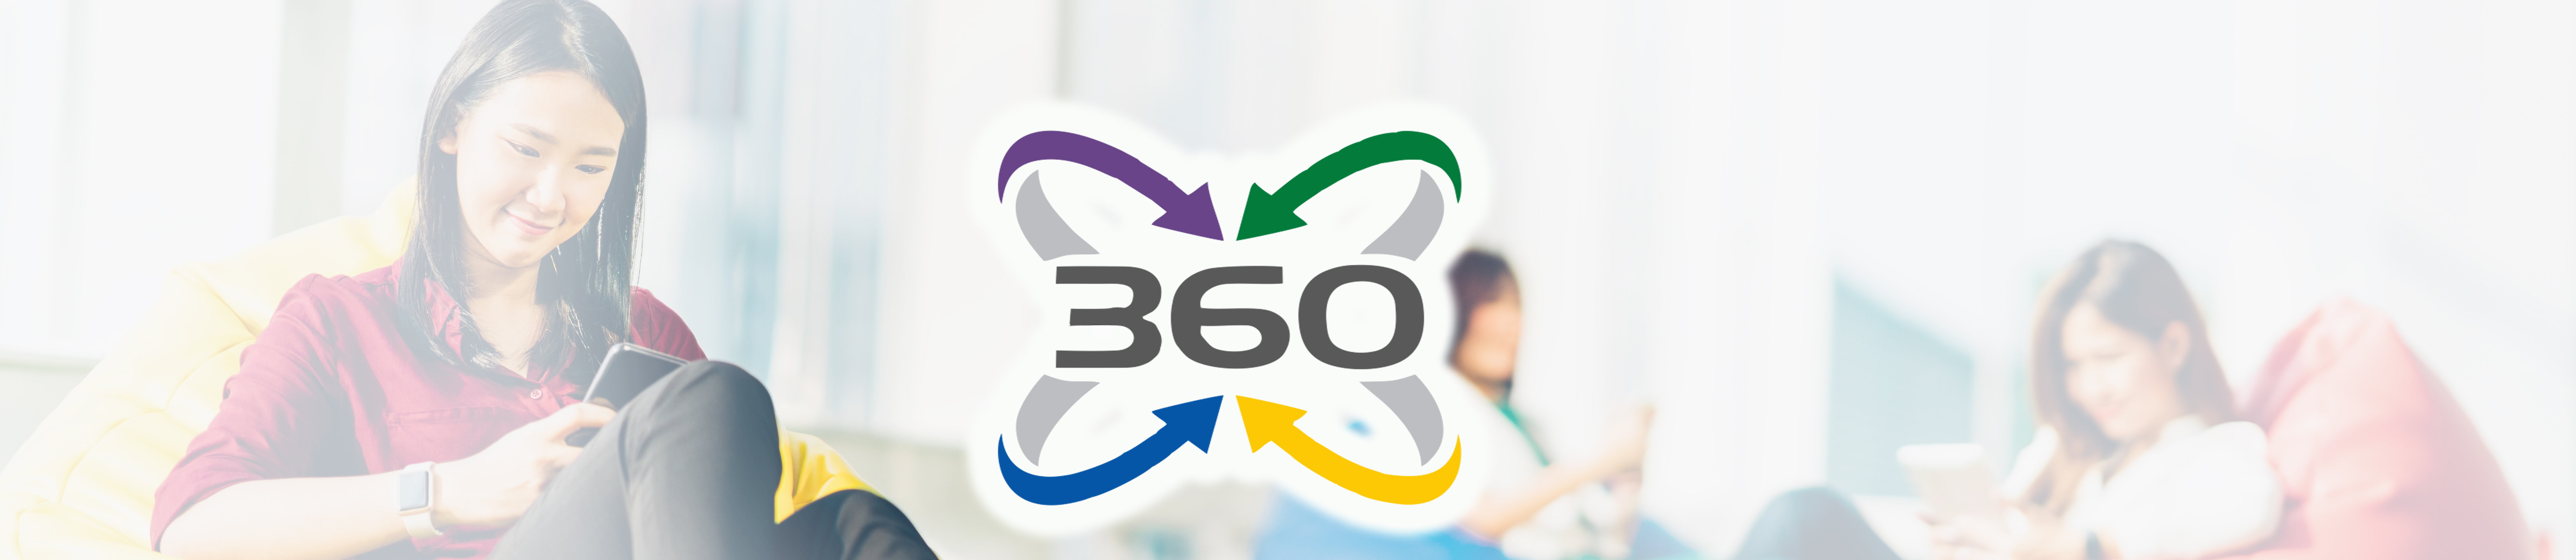 bannertour360